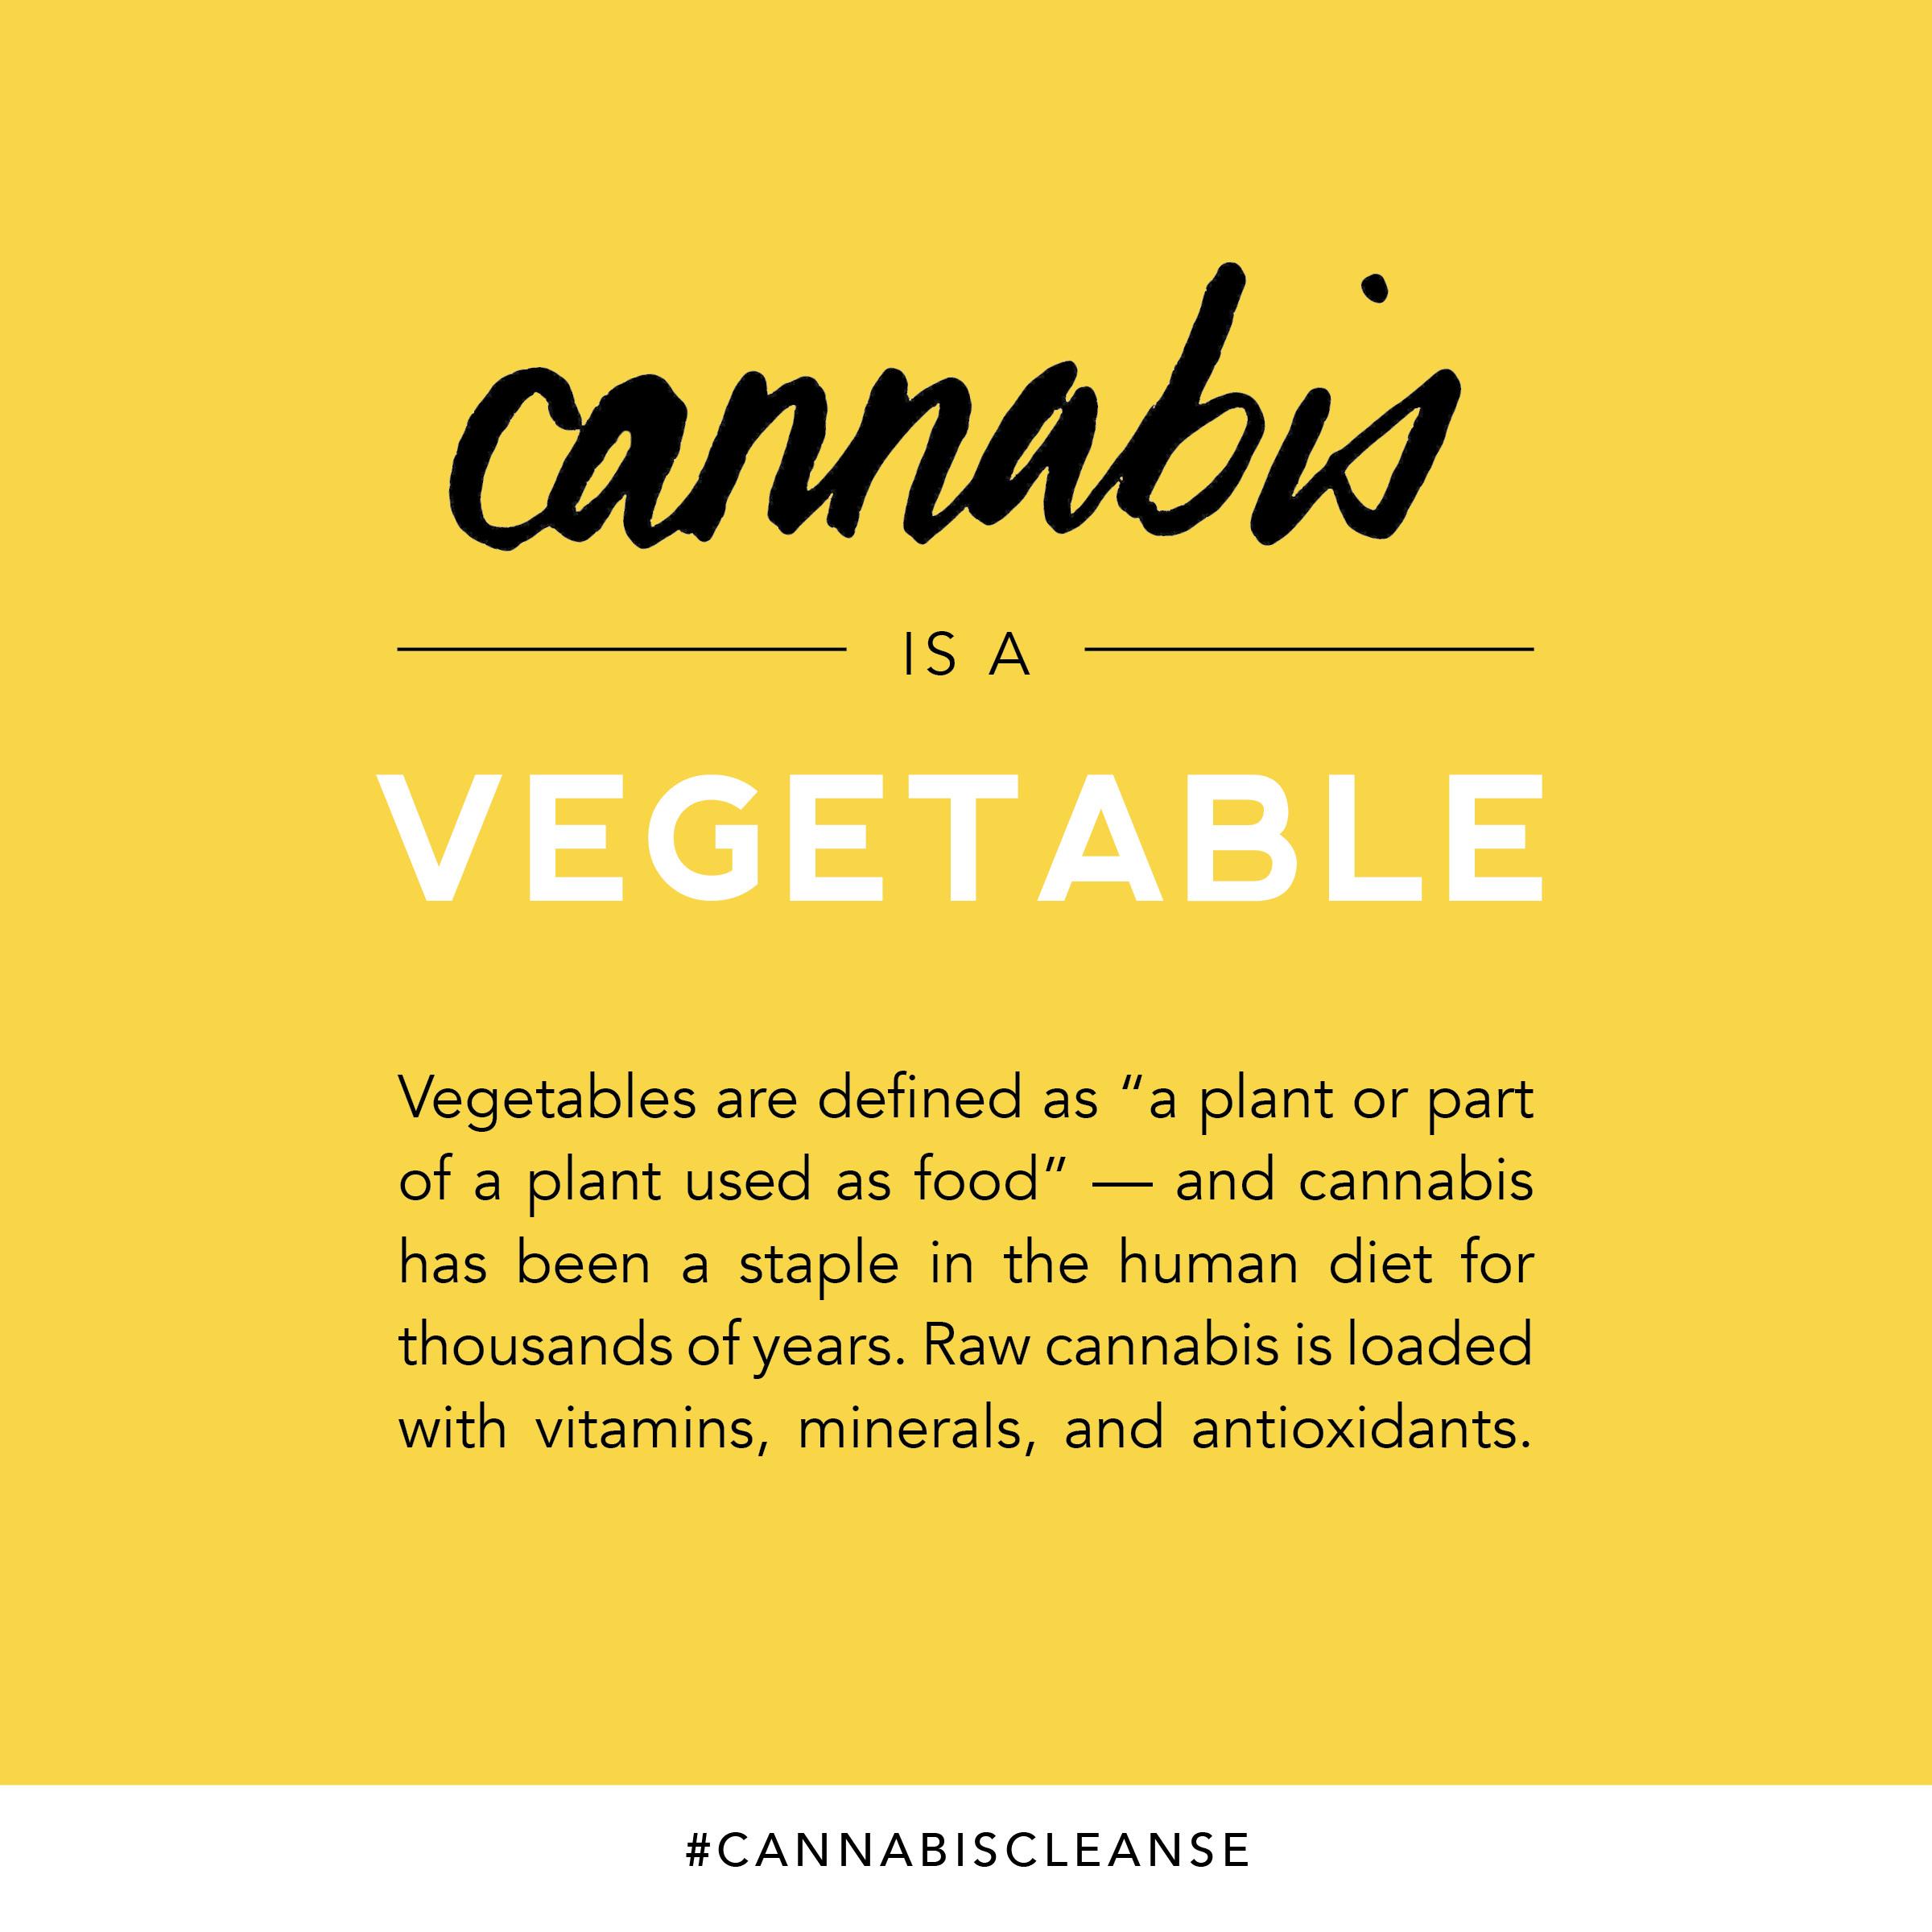 instagram-cannabiscleanse4.jpg